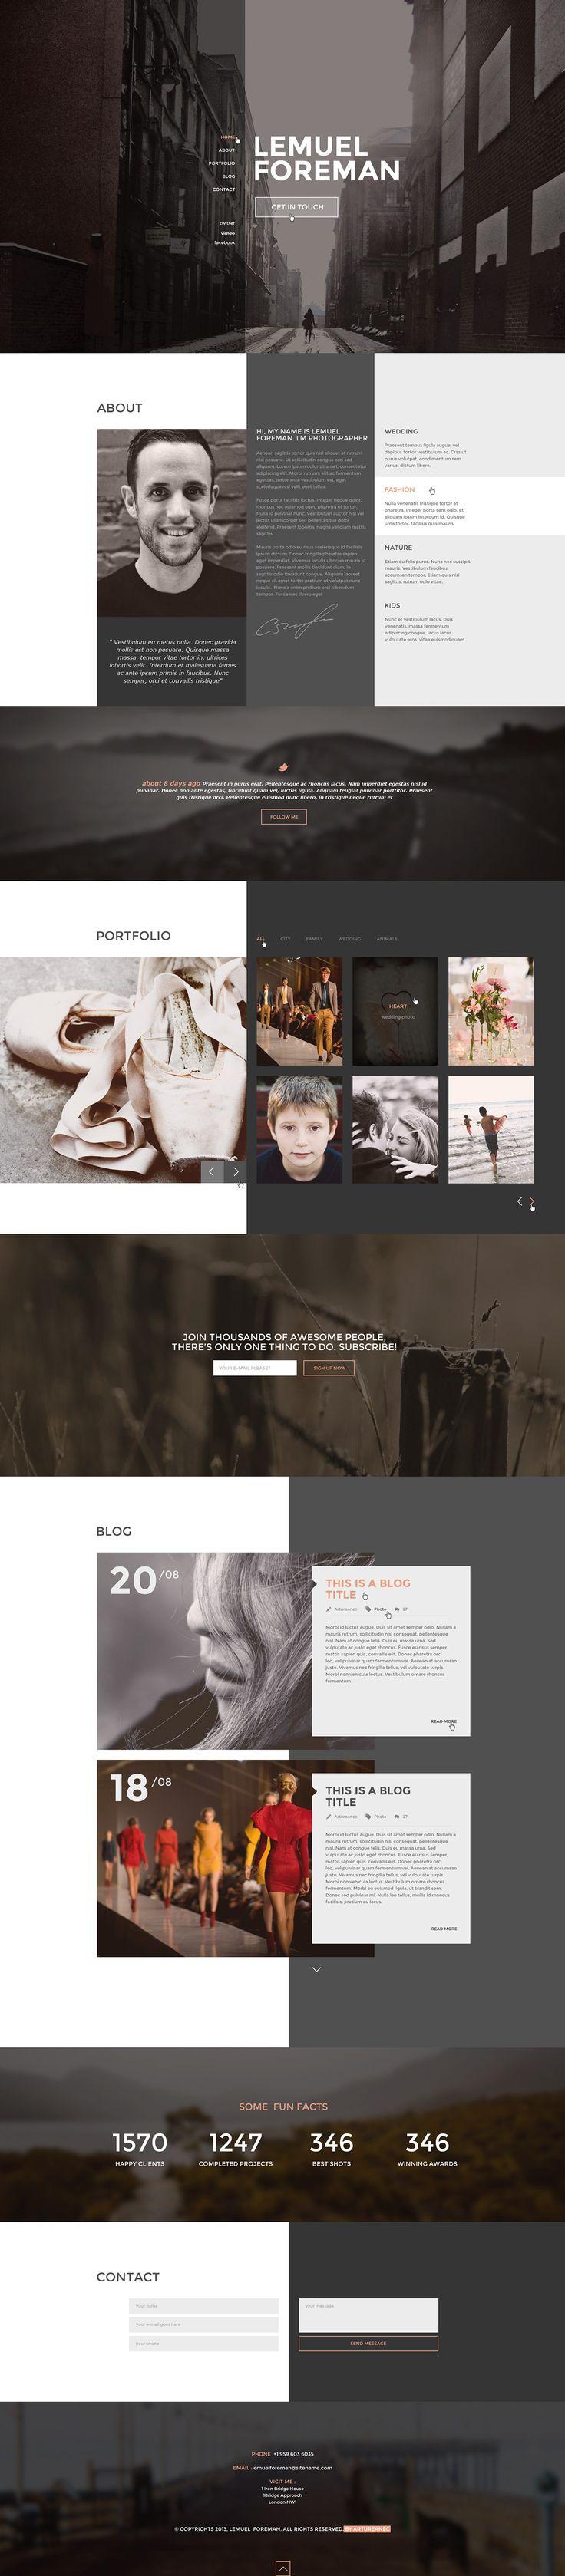 LF - One Page Multi Purpose Parallax HTML Theme on Behance